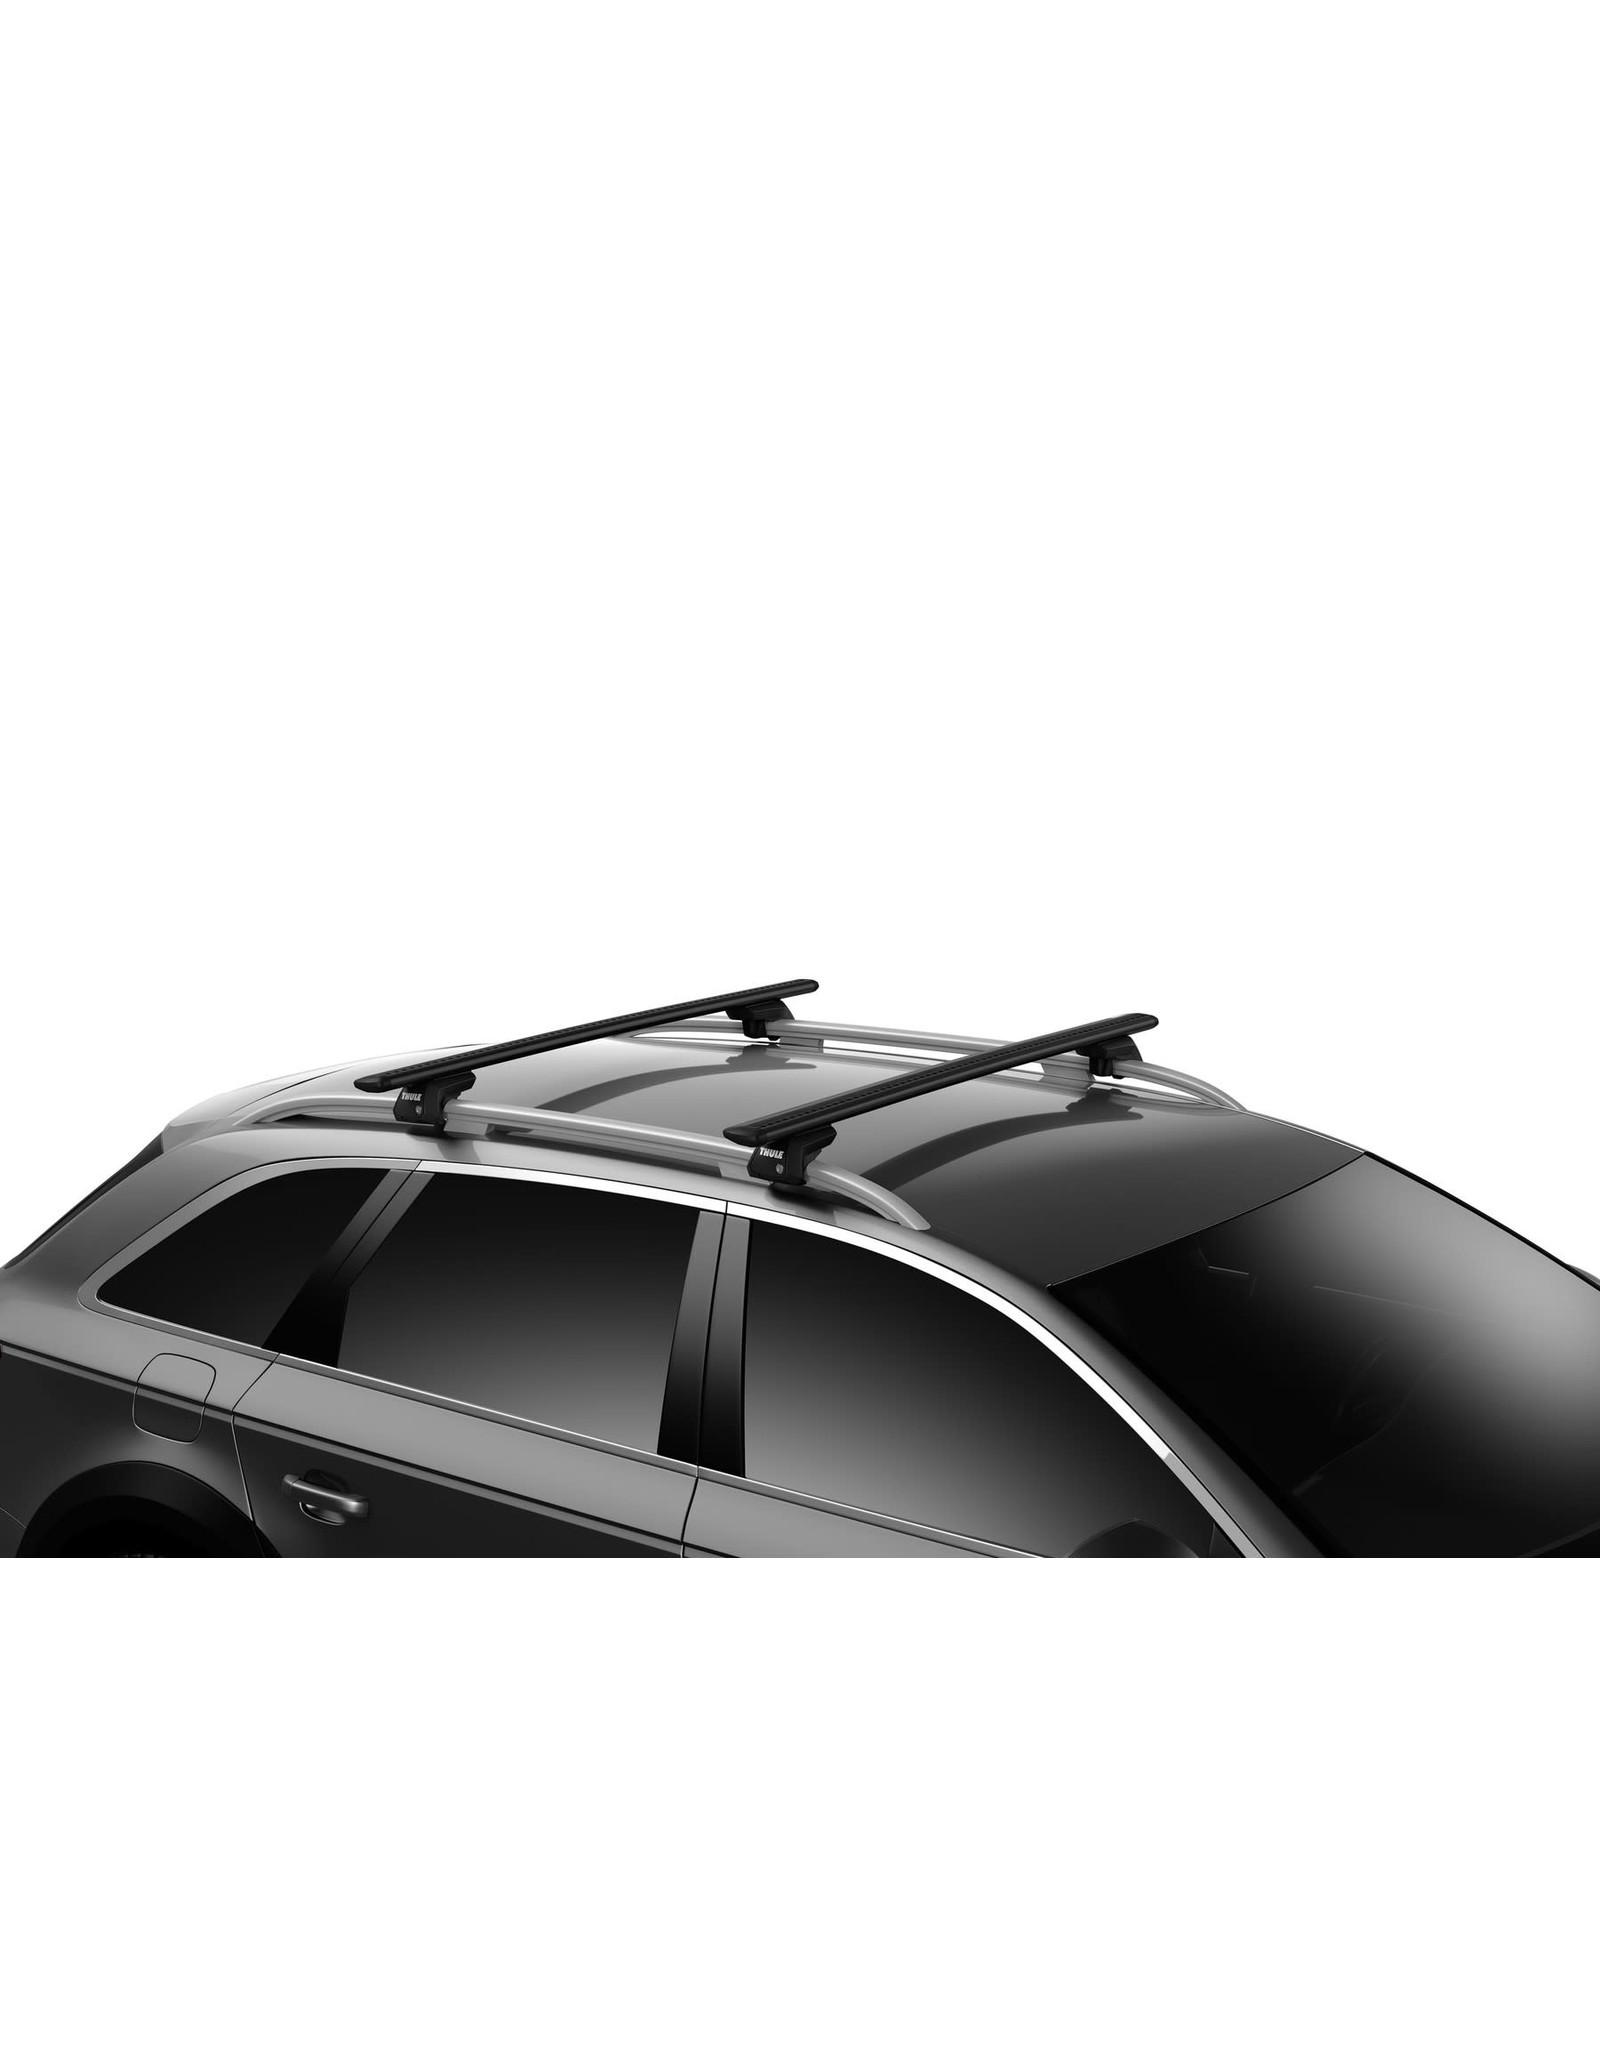 "THULE Wingbar Evo 150 (60"") Black"